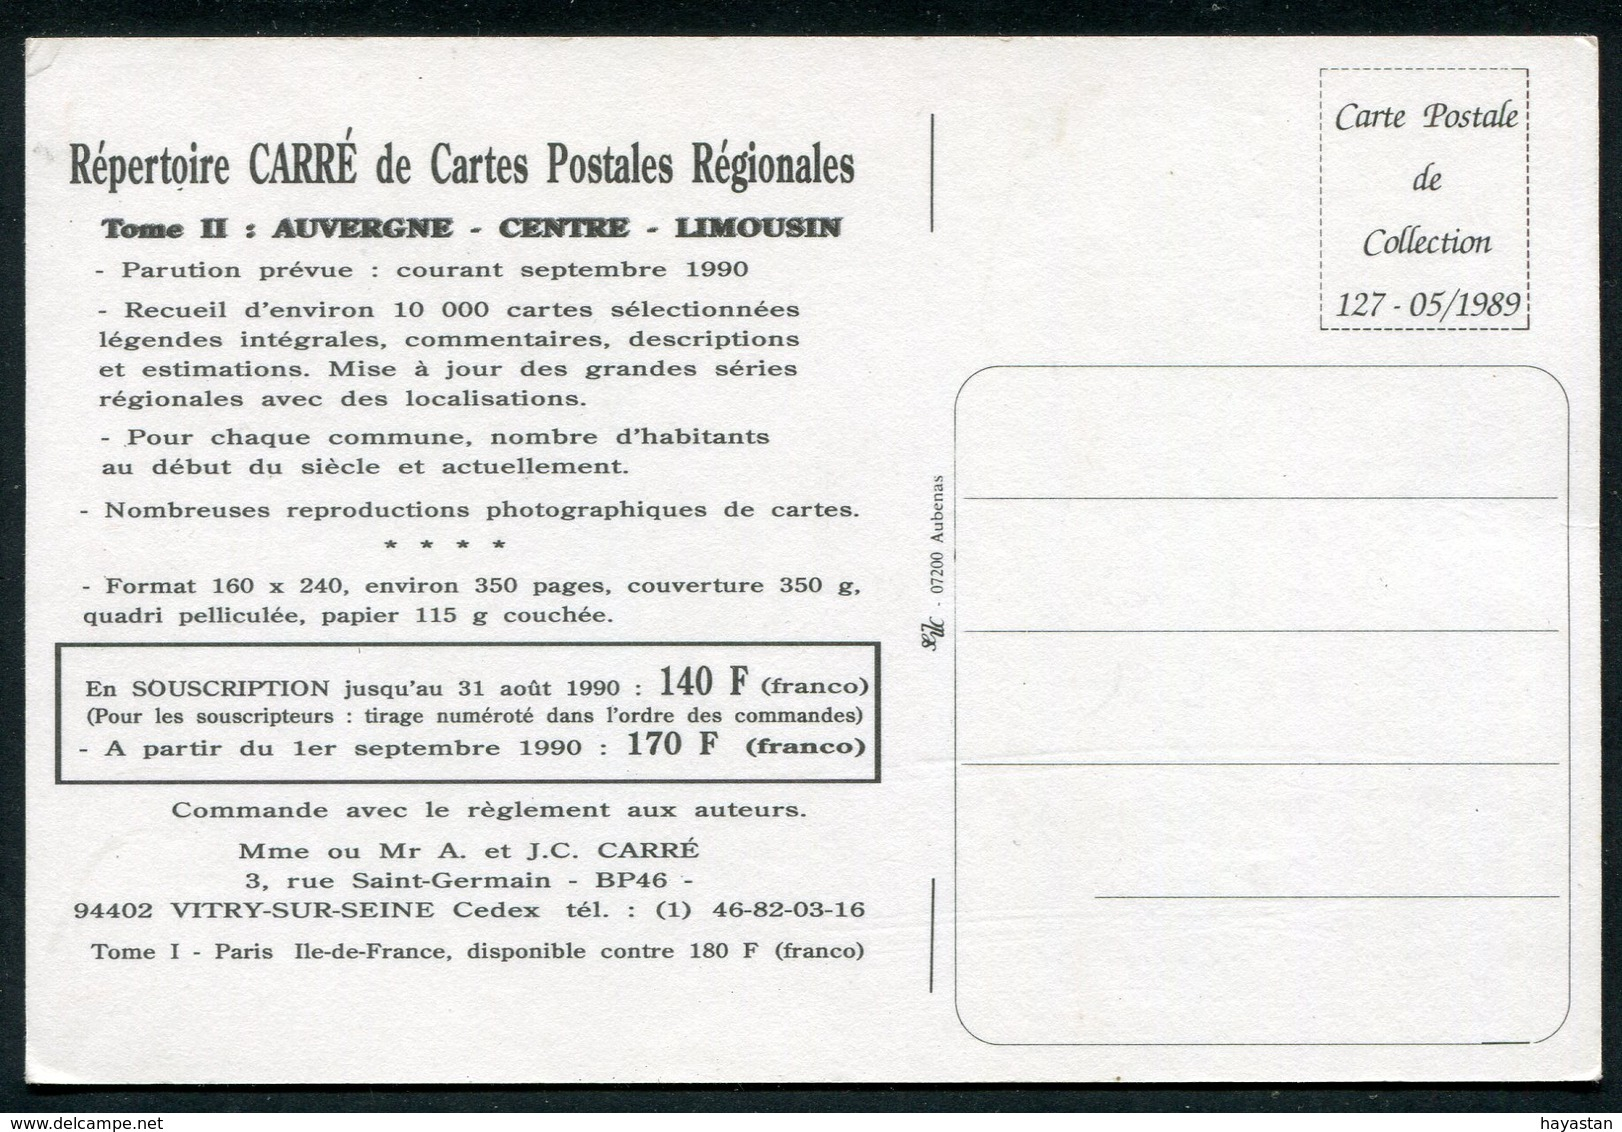 REPERTOIRE CARRE DE CARTES POSTALES REGIONALES - Français